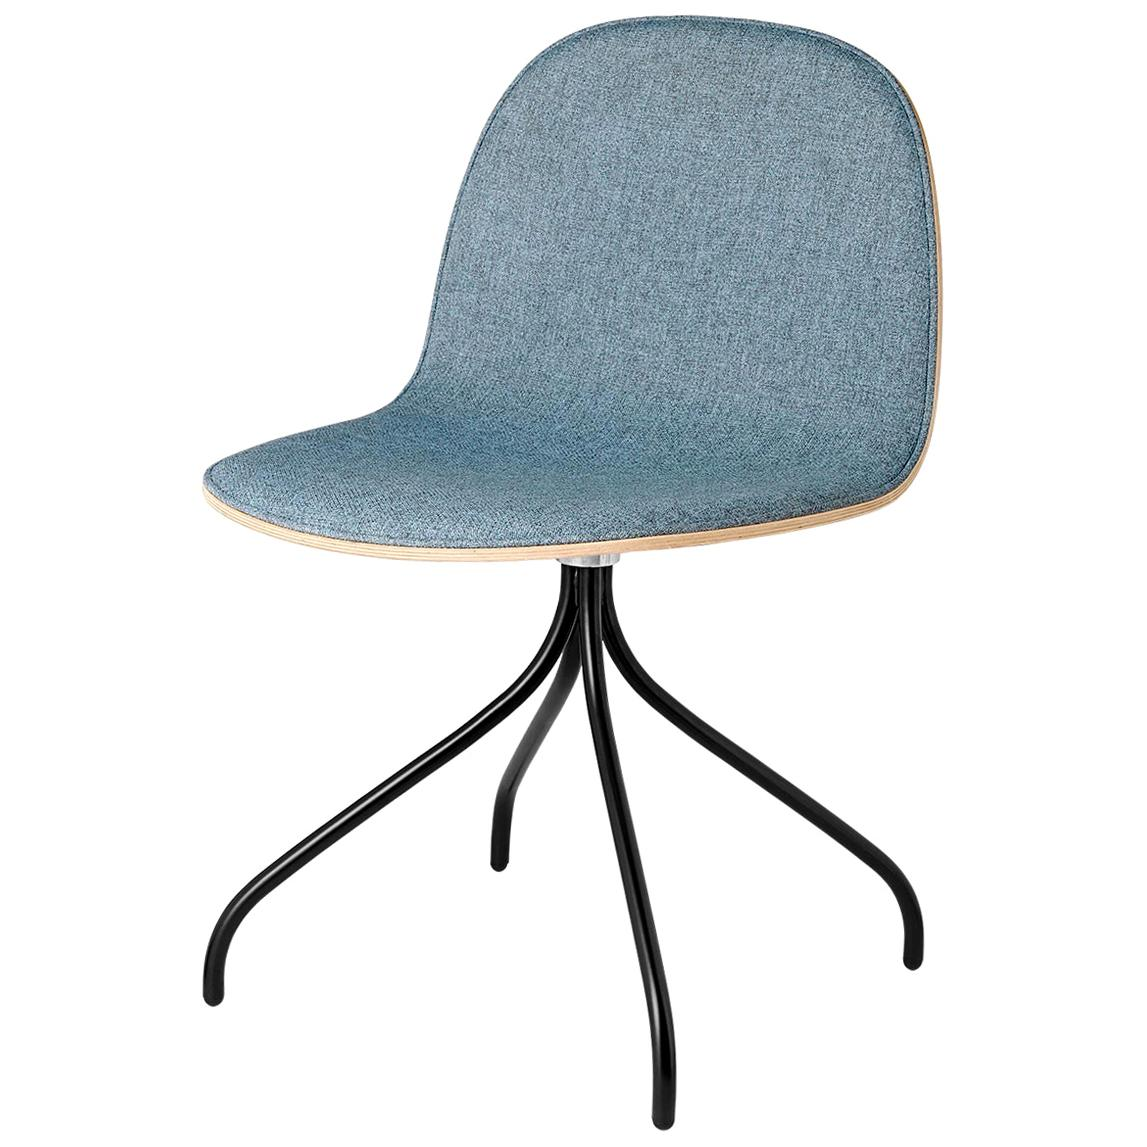 2D Meeting Chair, Front Upholstered, Black Swivel Base, Natural Oak